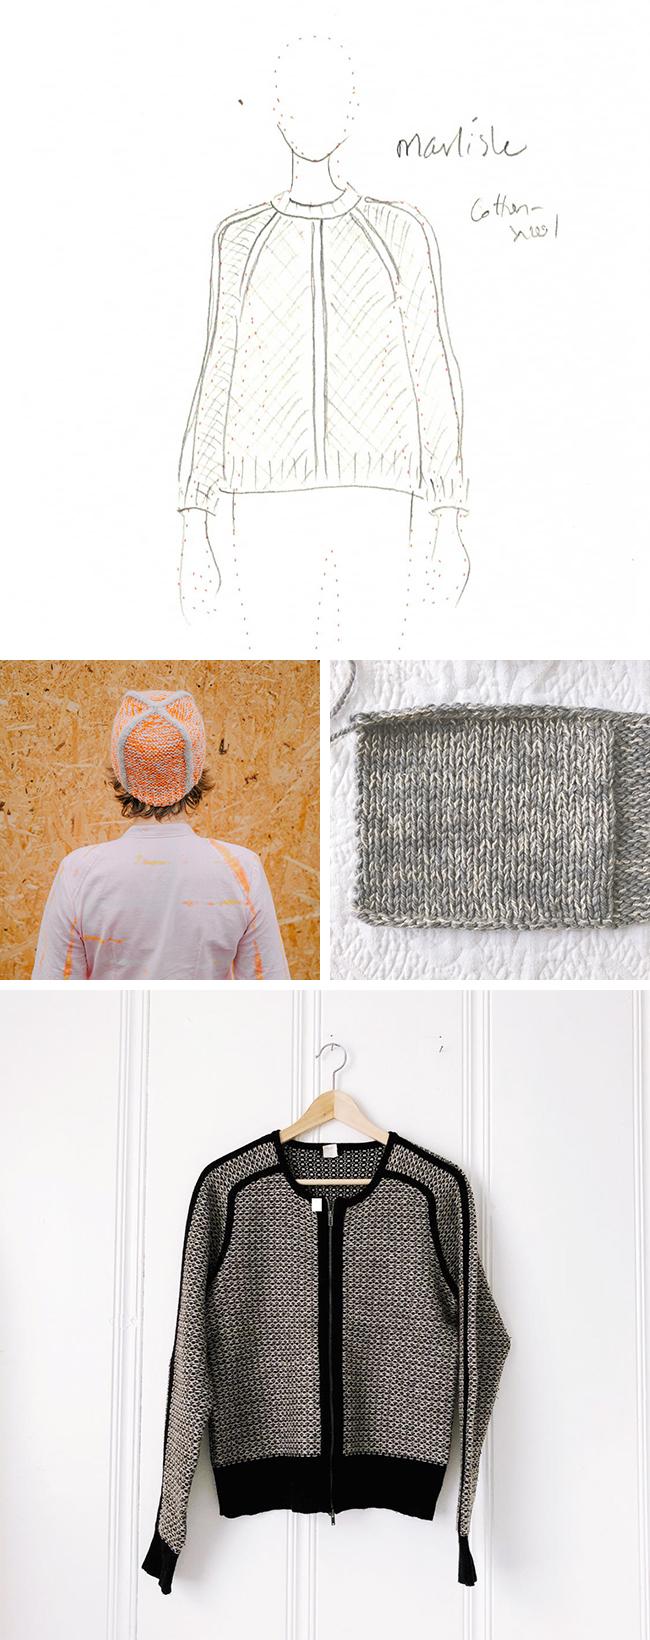 Idea Log: Marlisle-inspired pullover